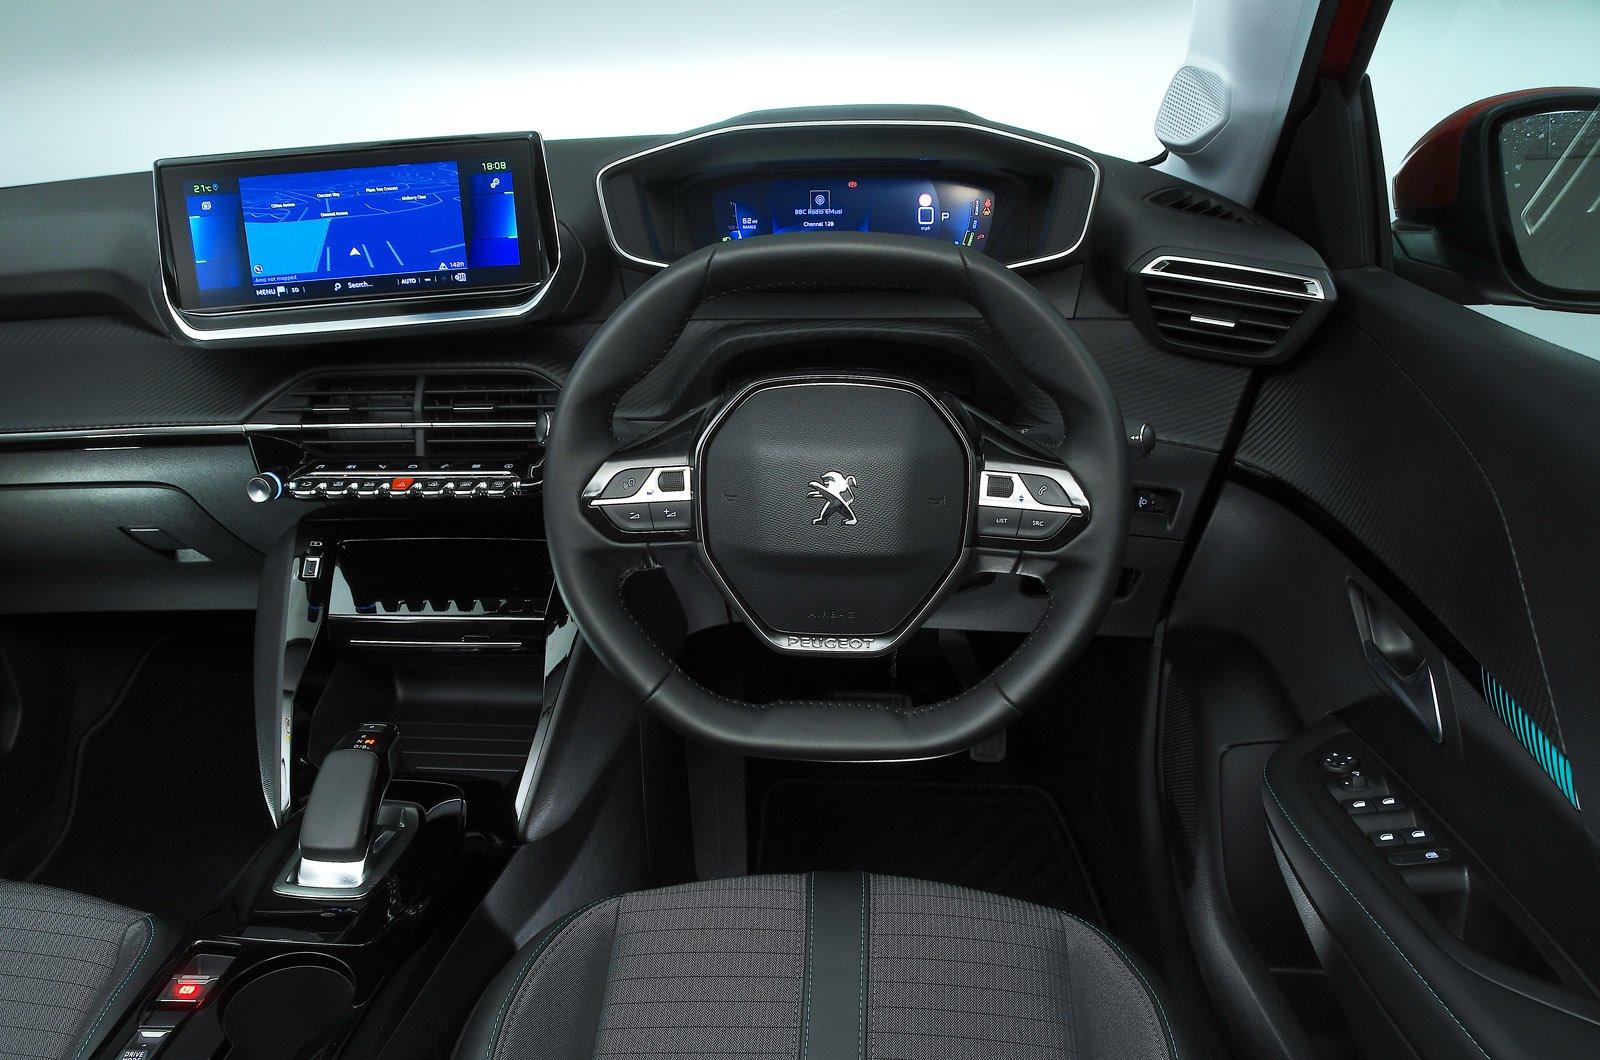 Peugeot e-208 dashboard